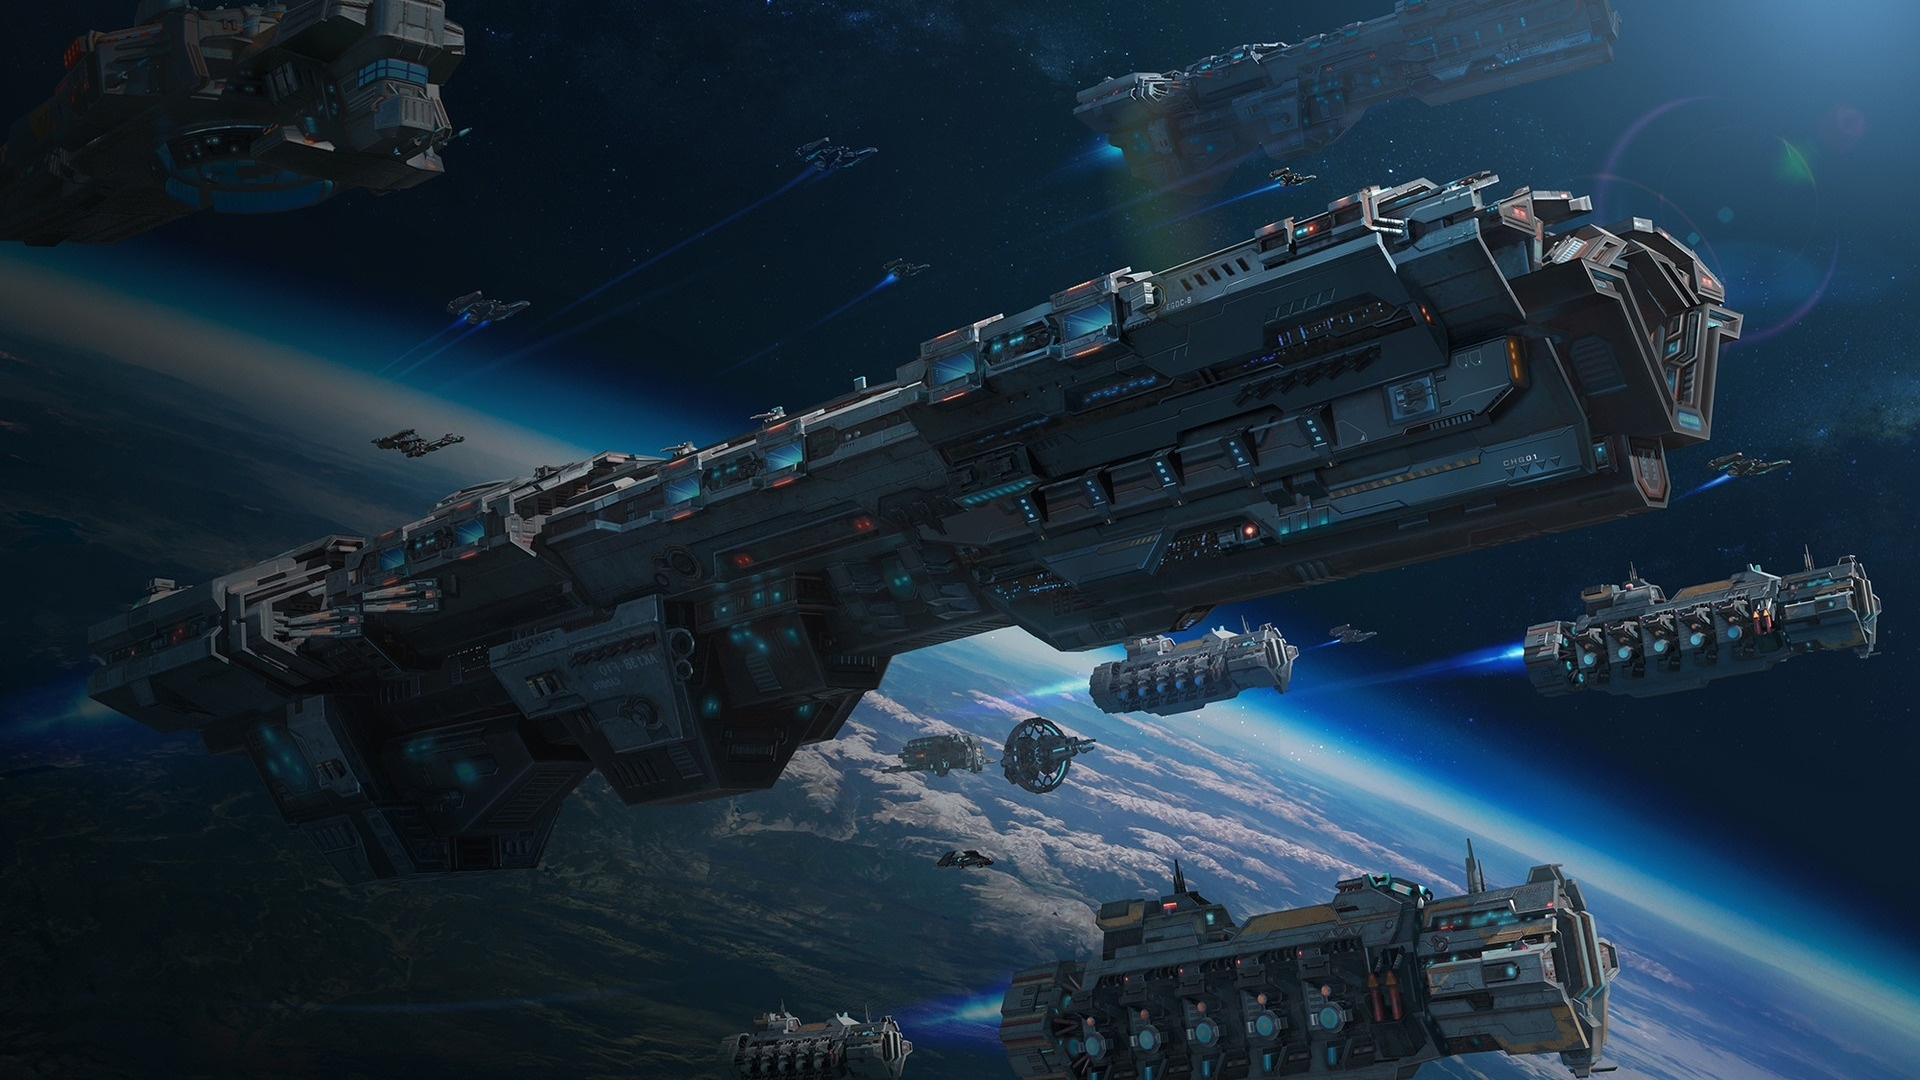 Spaceships Art computer wallpaper